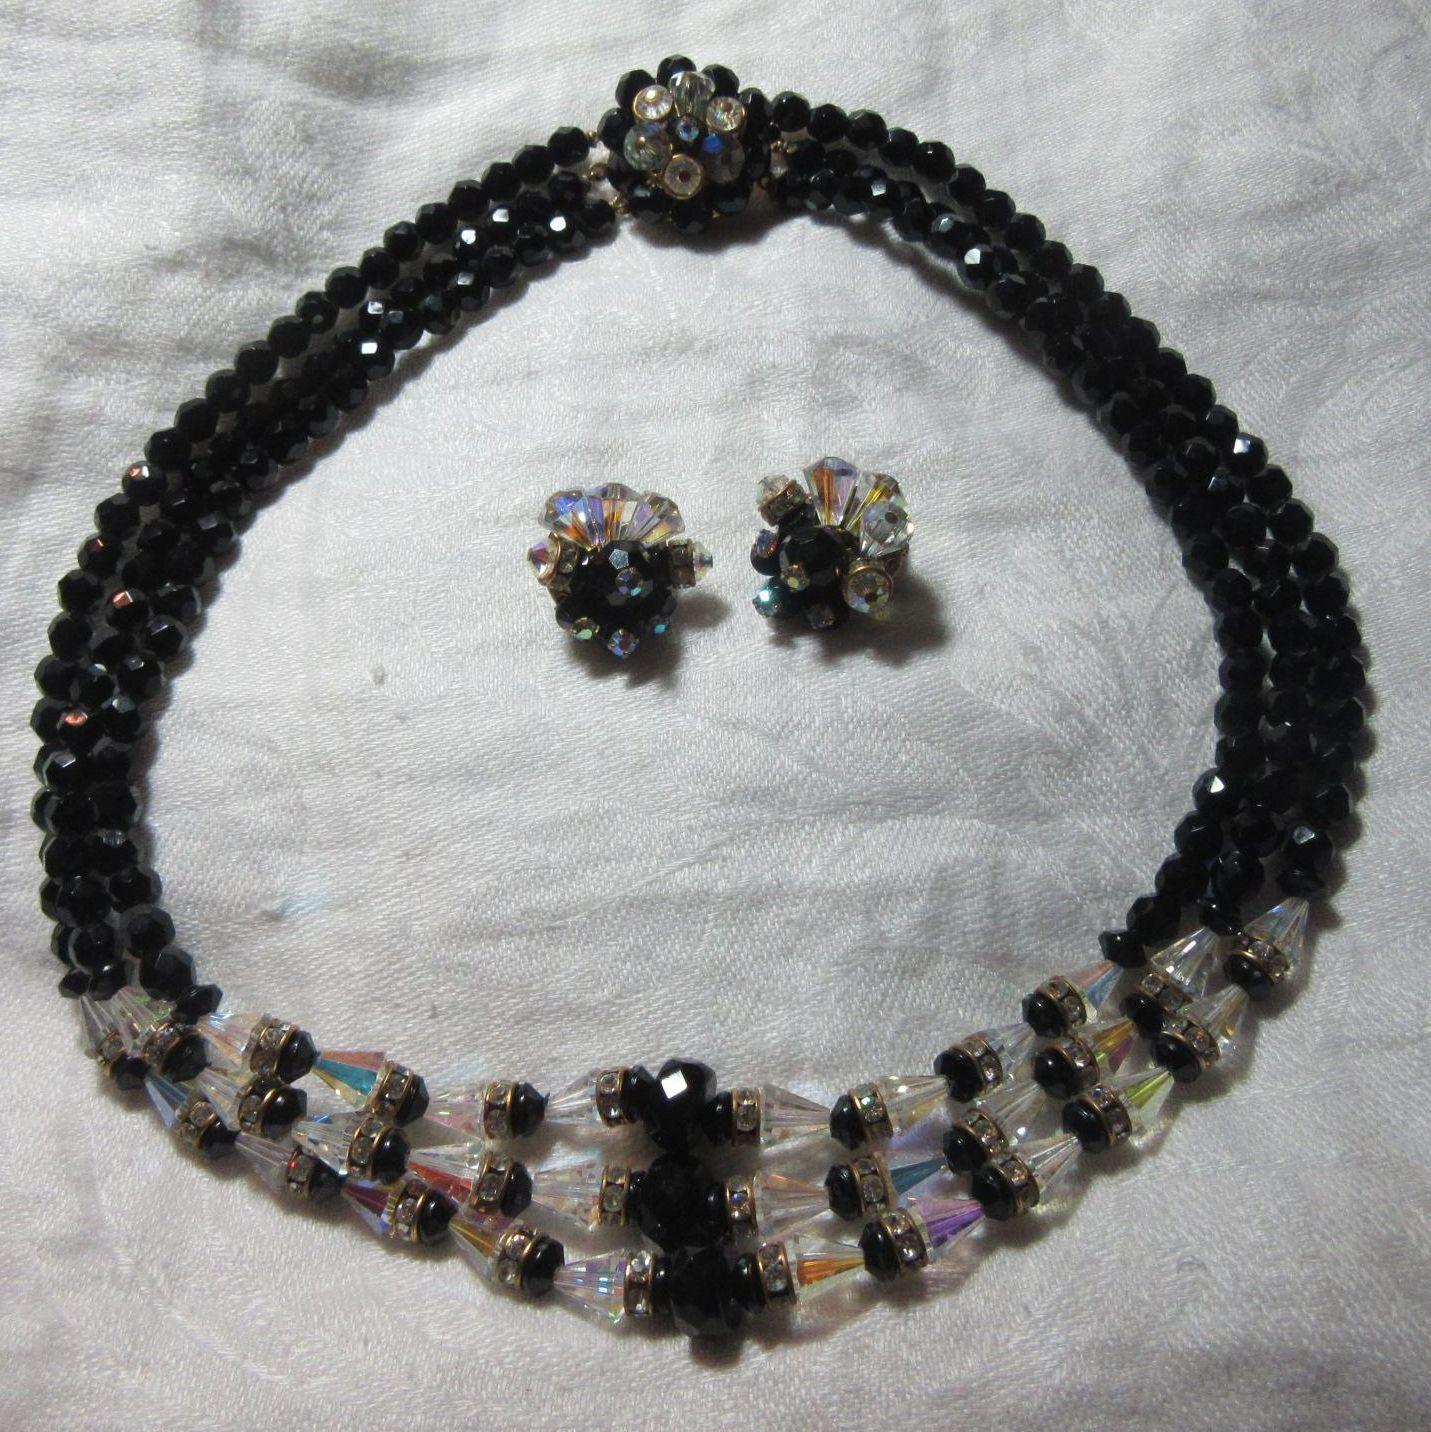 Crystal Black Beads & Rhinestone Necklace & Clip Earring Set